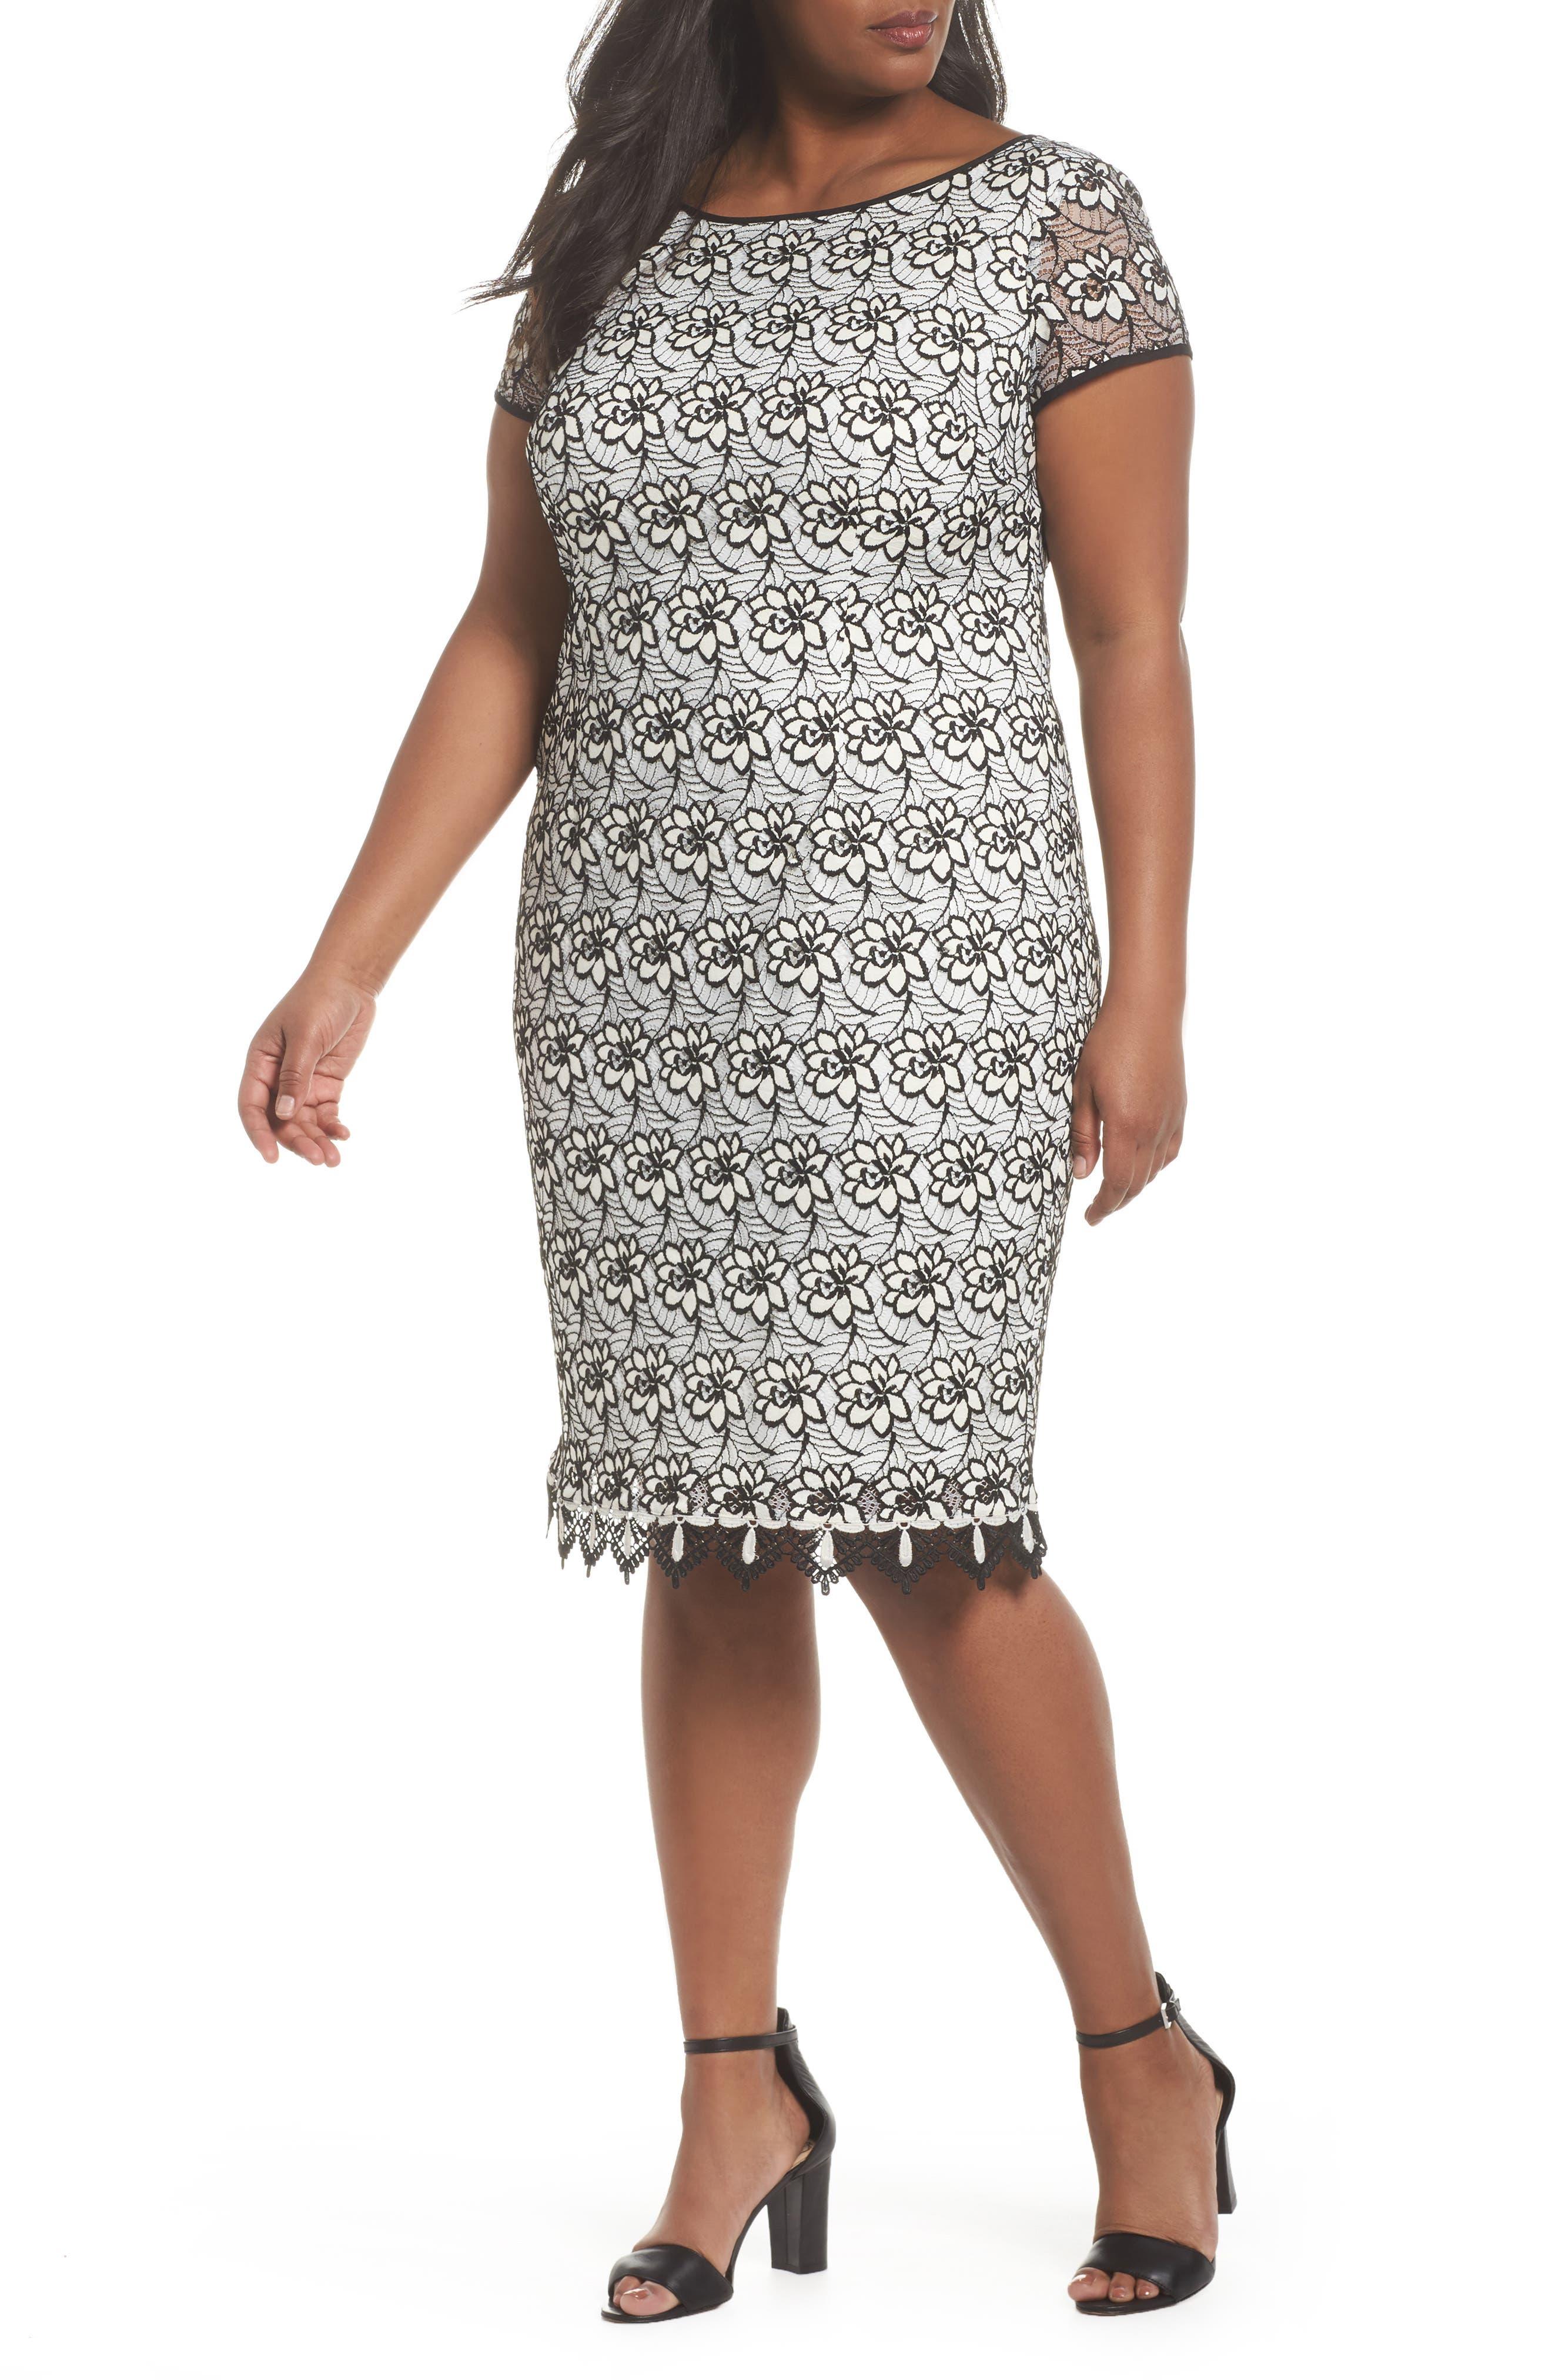 Lace Trim Sheath Dress,                             Main thumbnail 1, color,                             Ivory/ Black